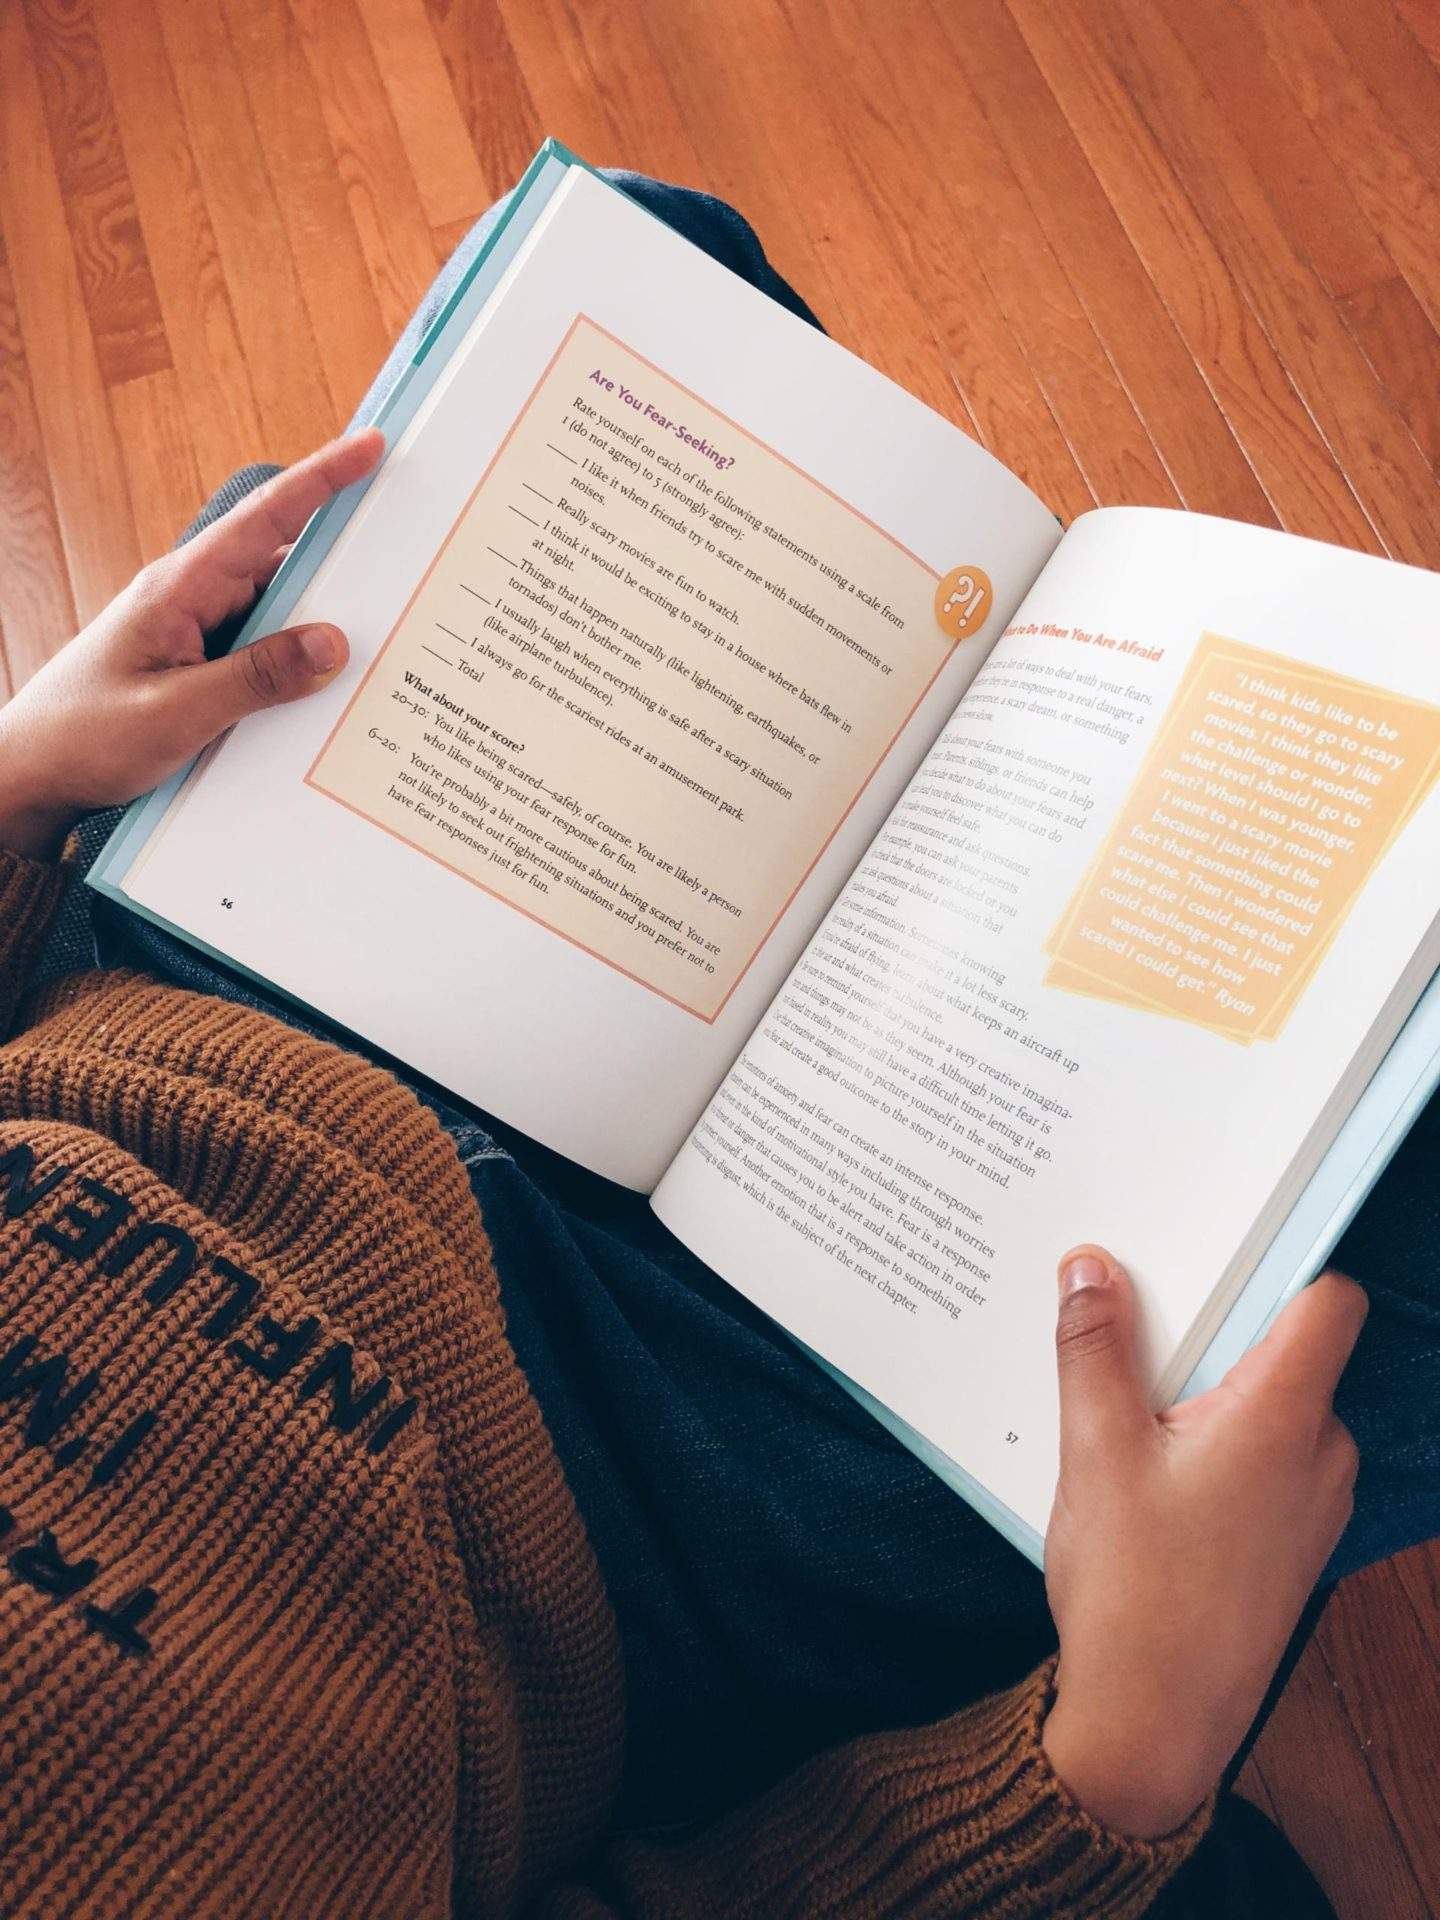 school made easy book for children